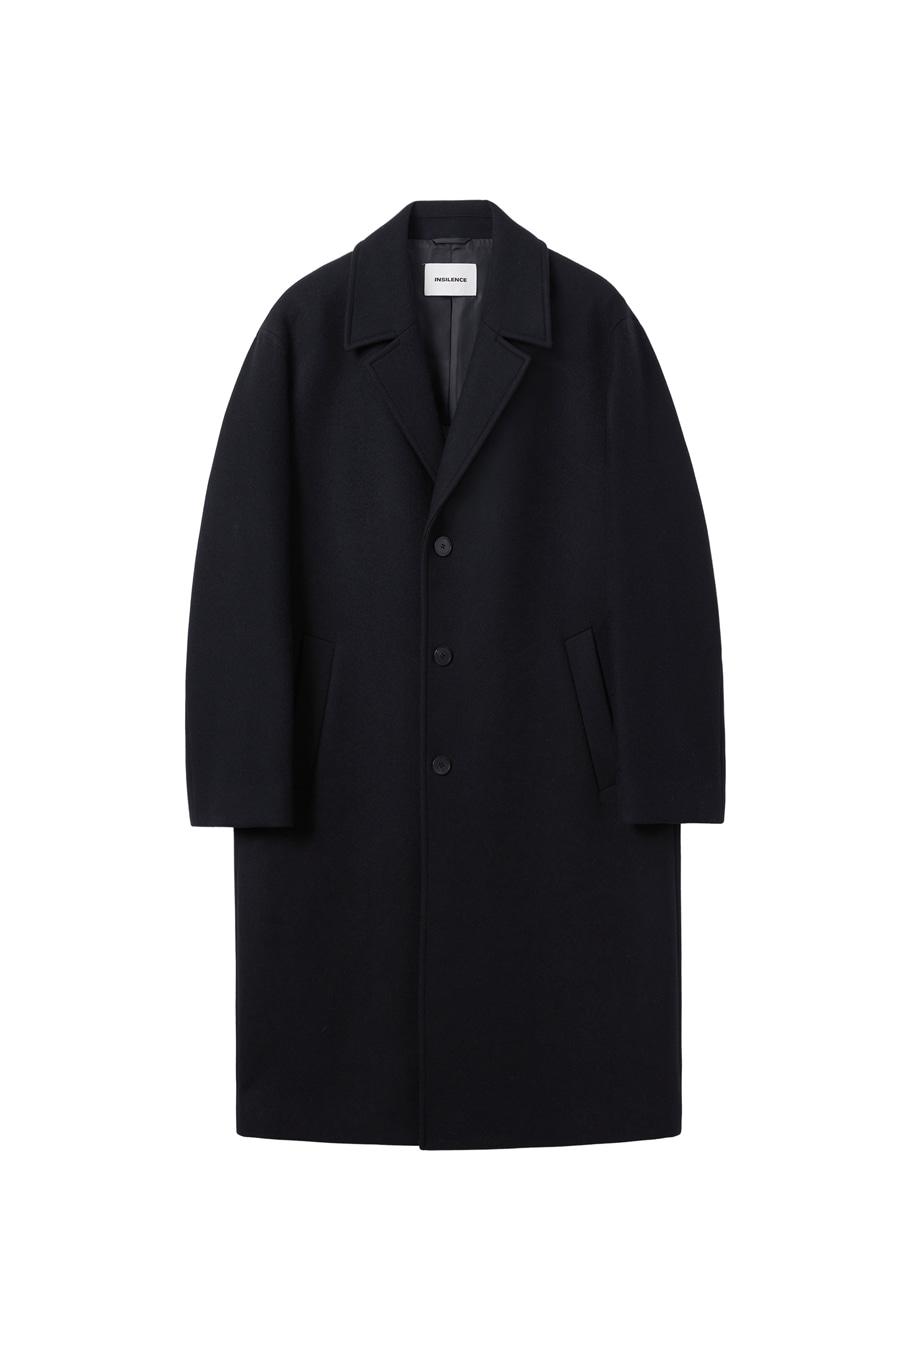 MTR 싱글 코트 BLACK